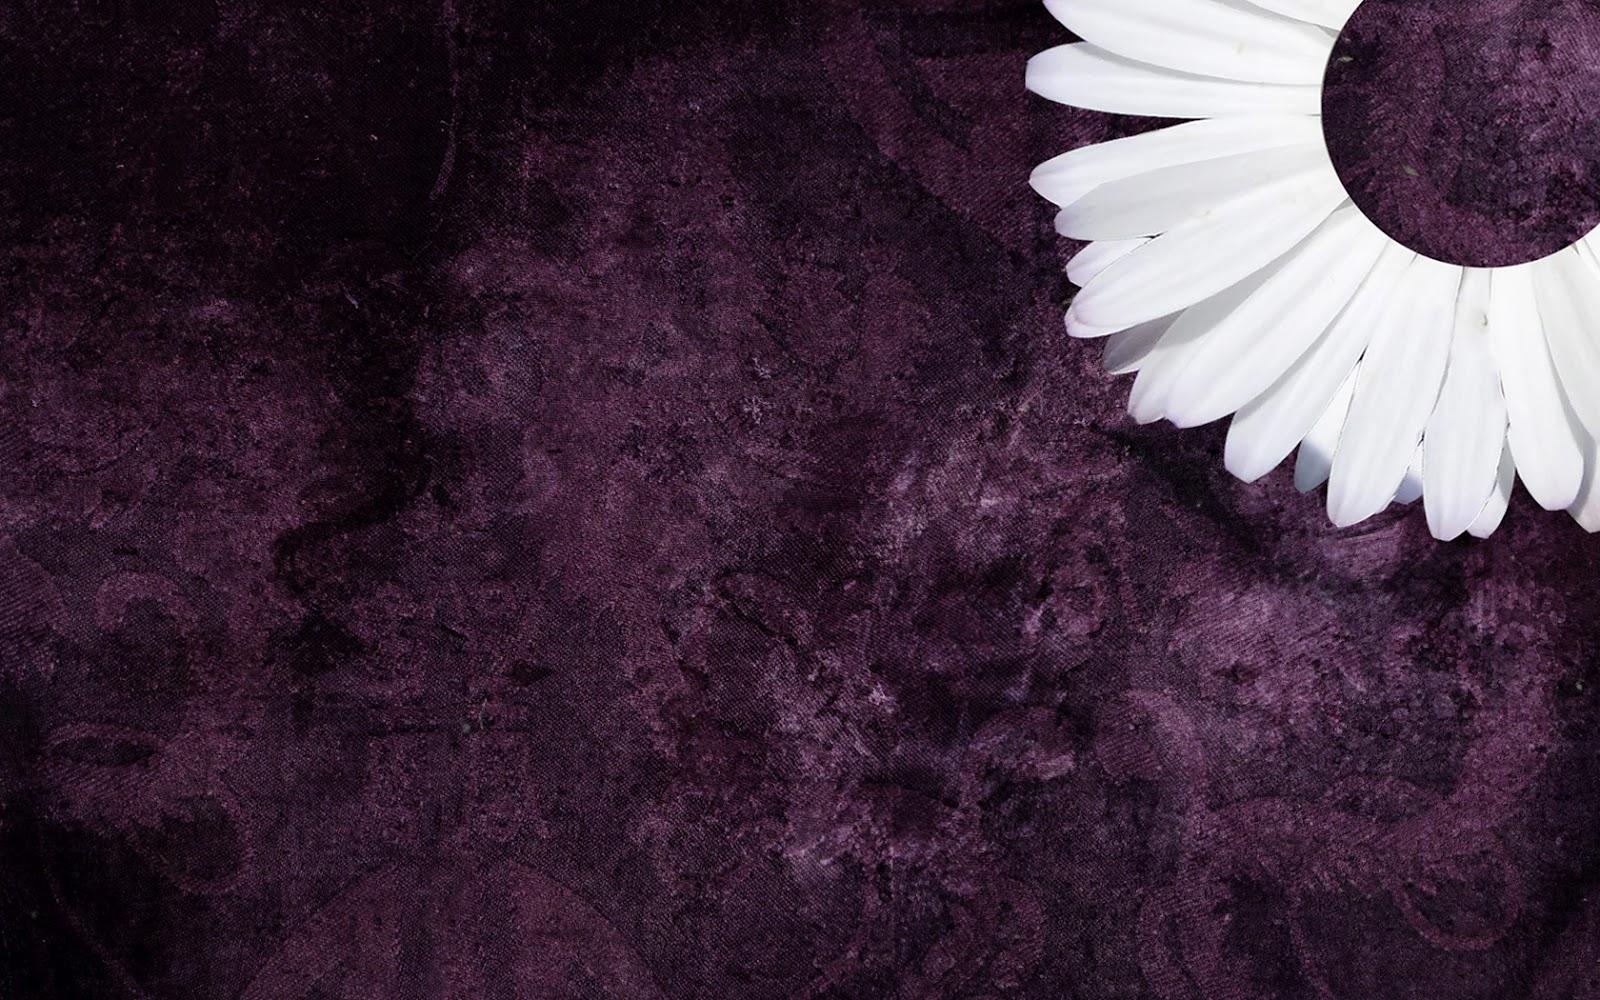 4 Free Purple Daisy Tumblr Backgrounds | ibjennyjenny ...